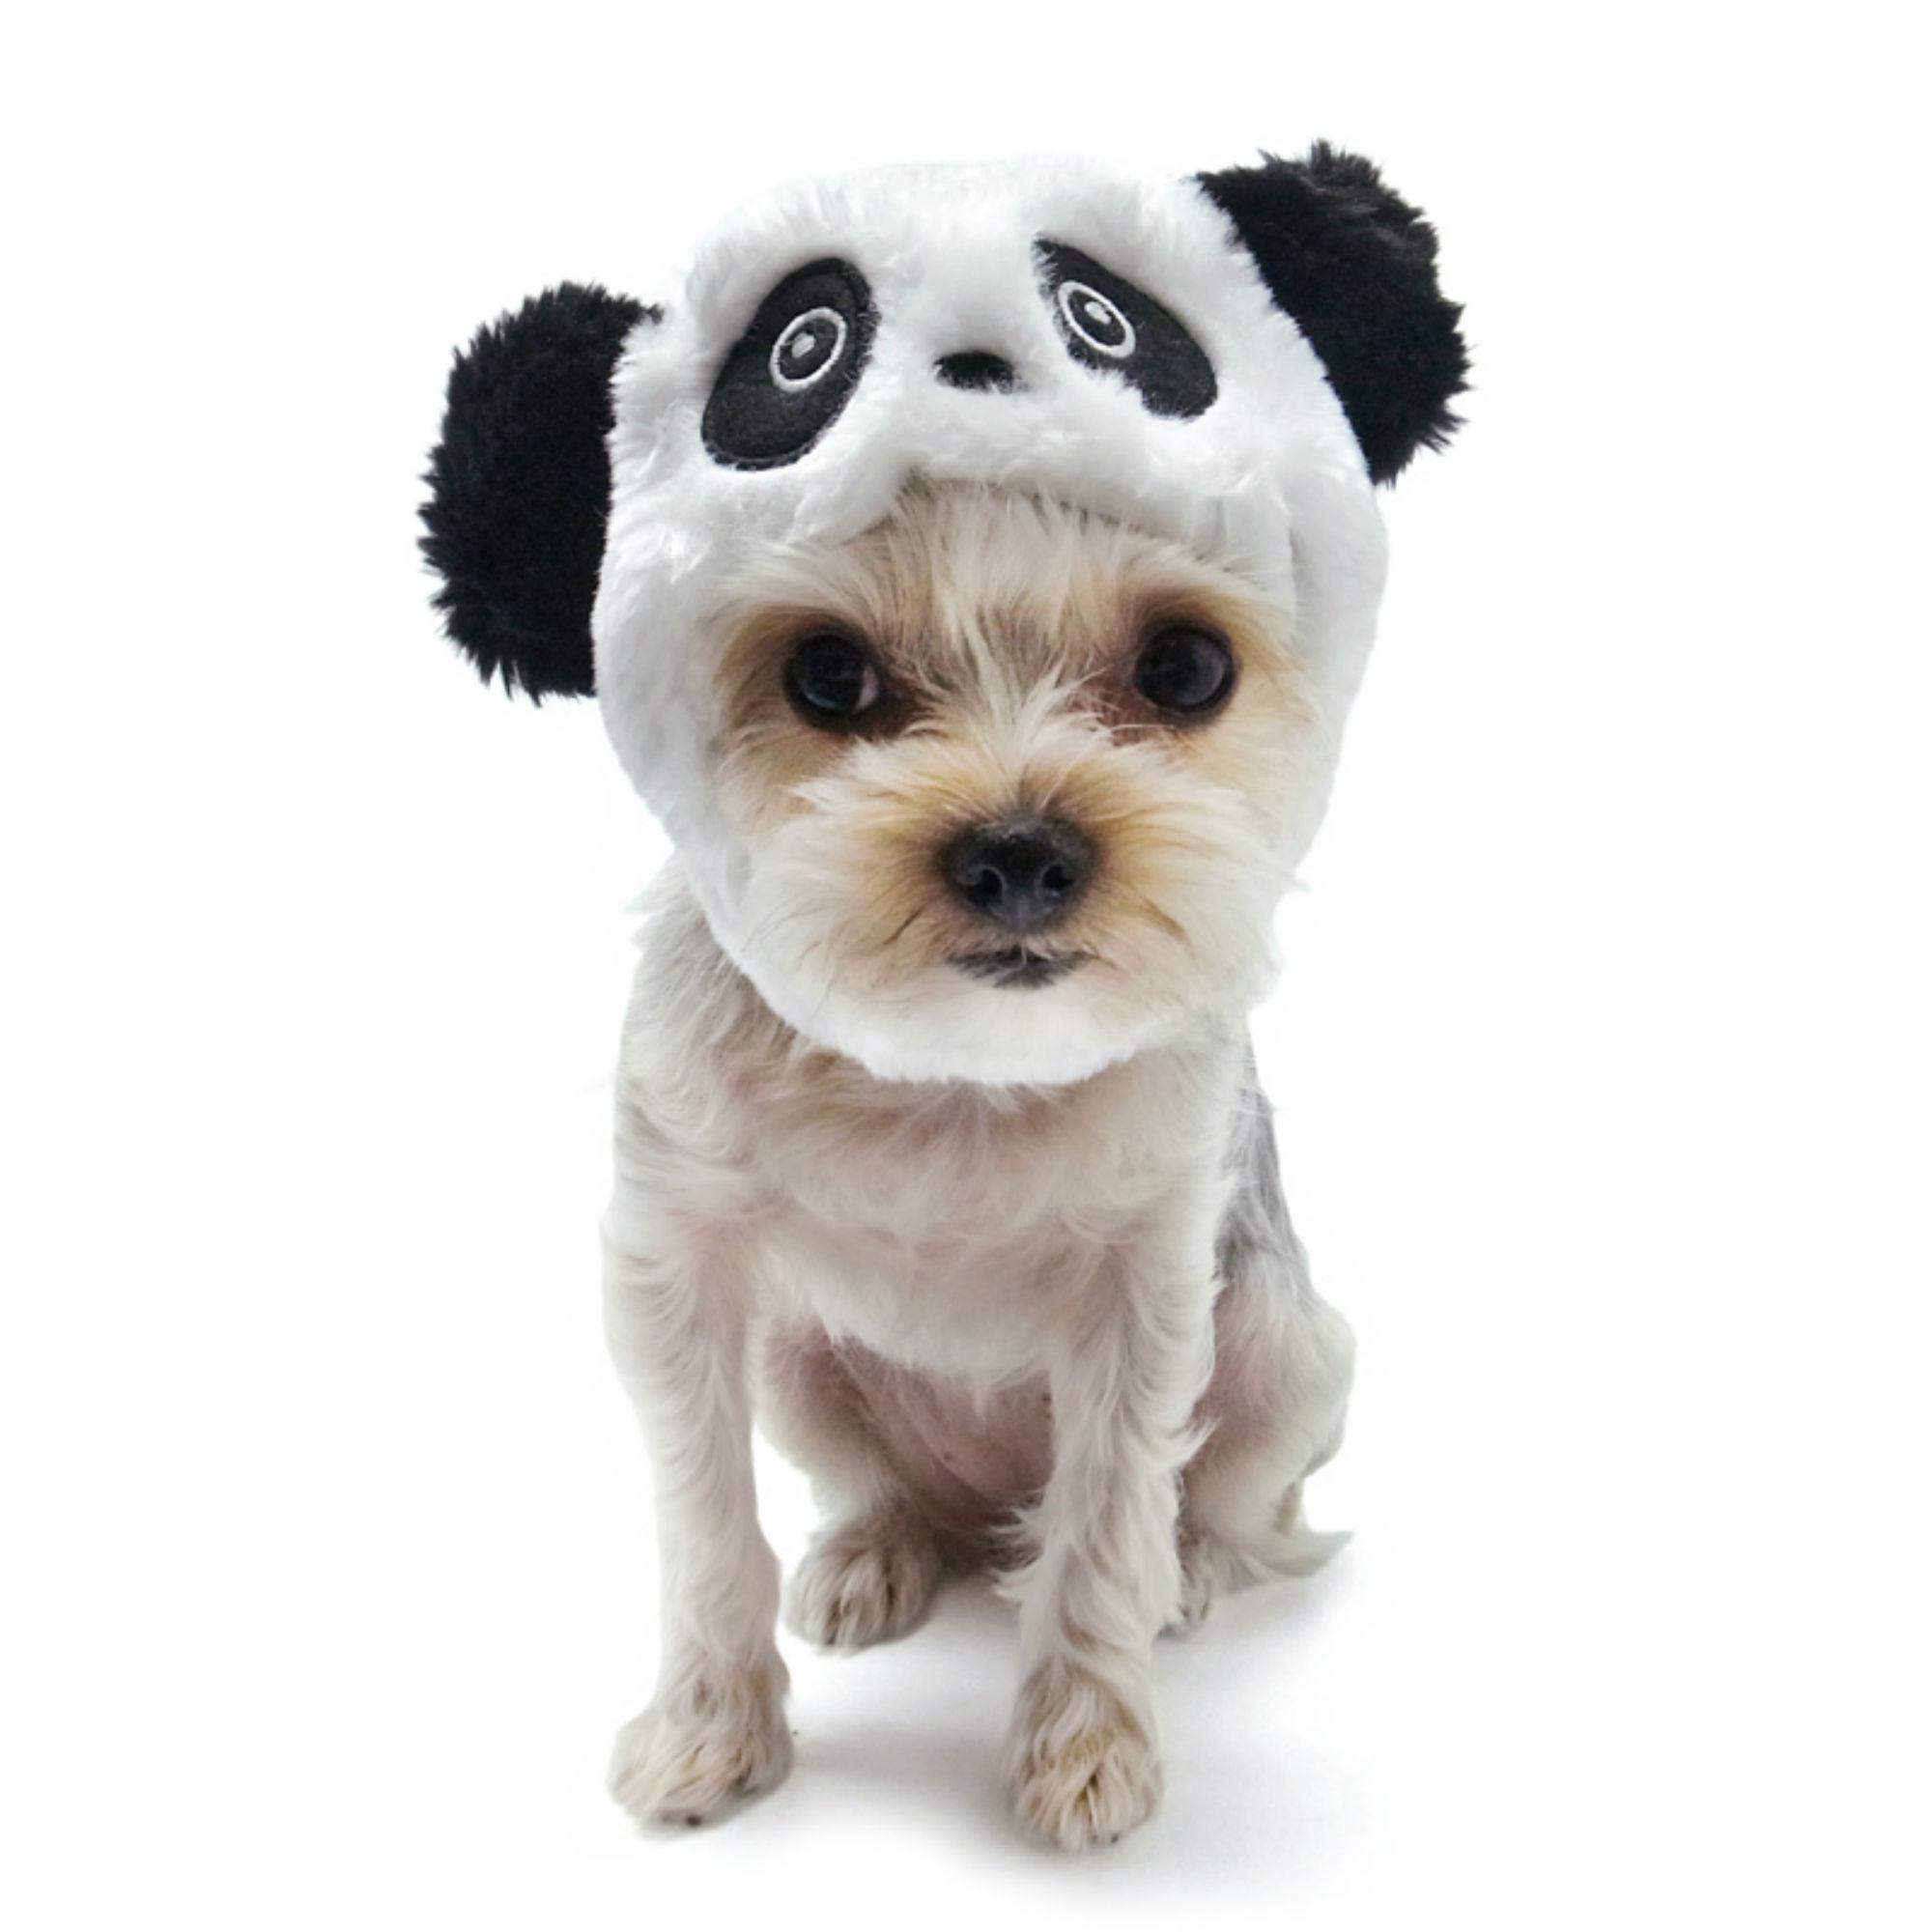 e02aaa5cb81 Panda Dog Hat by Dogo